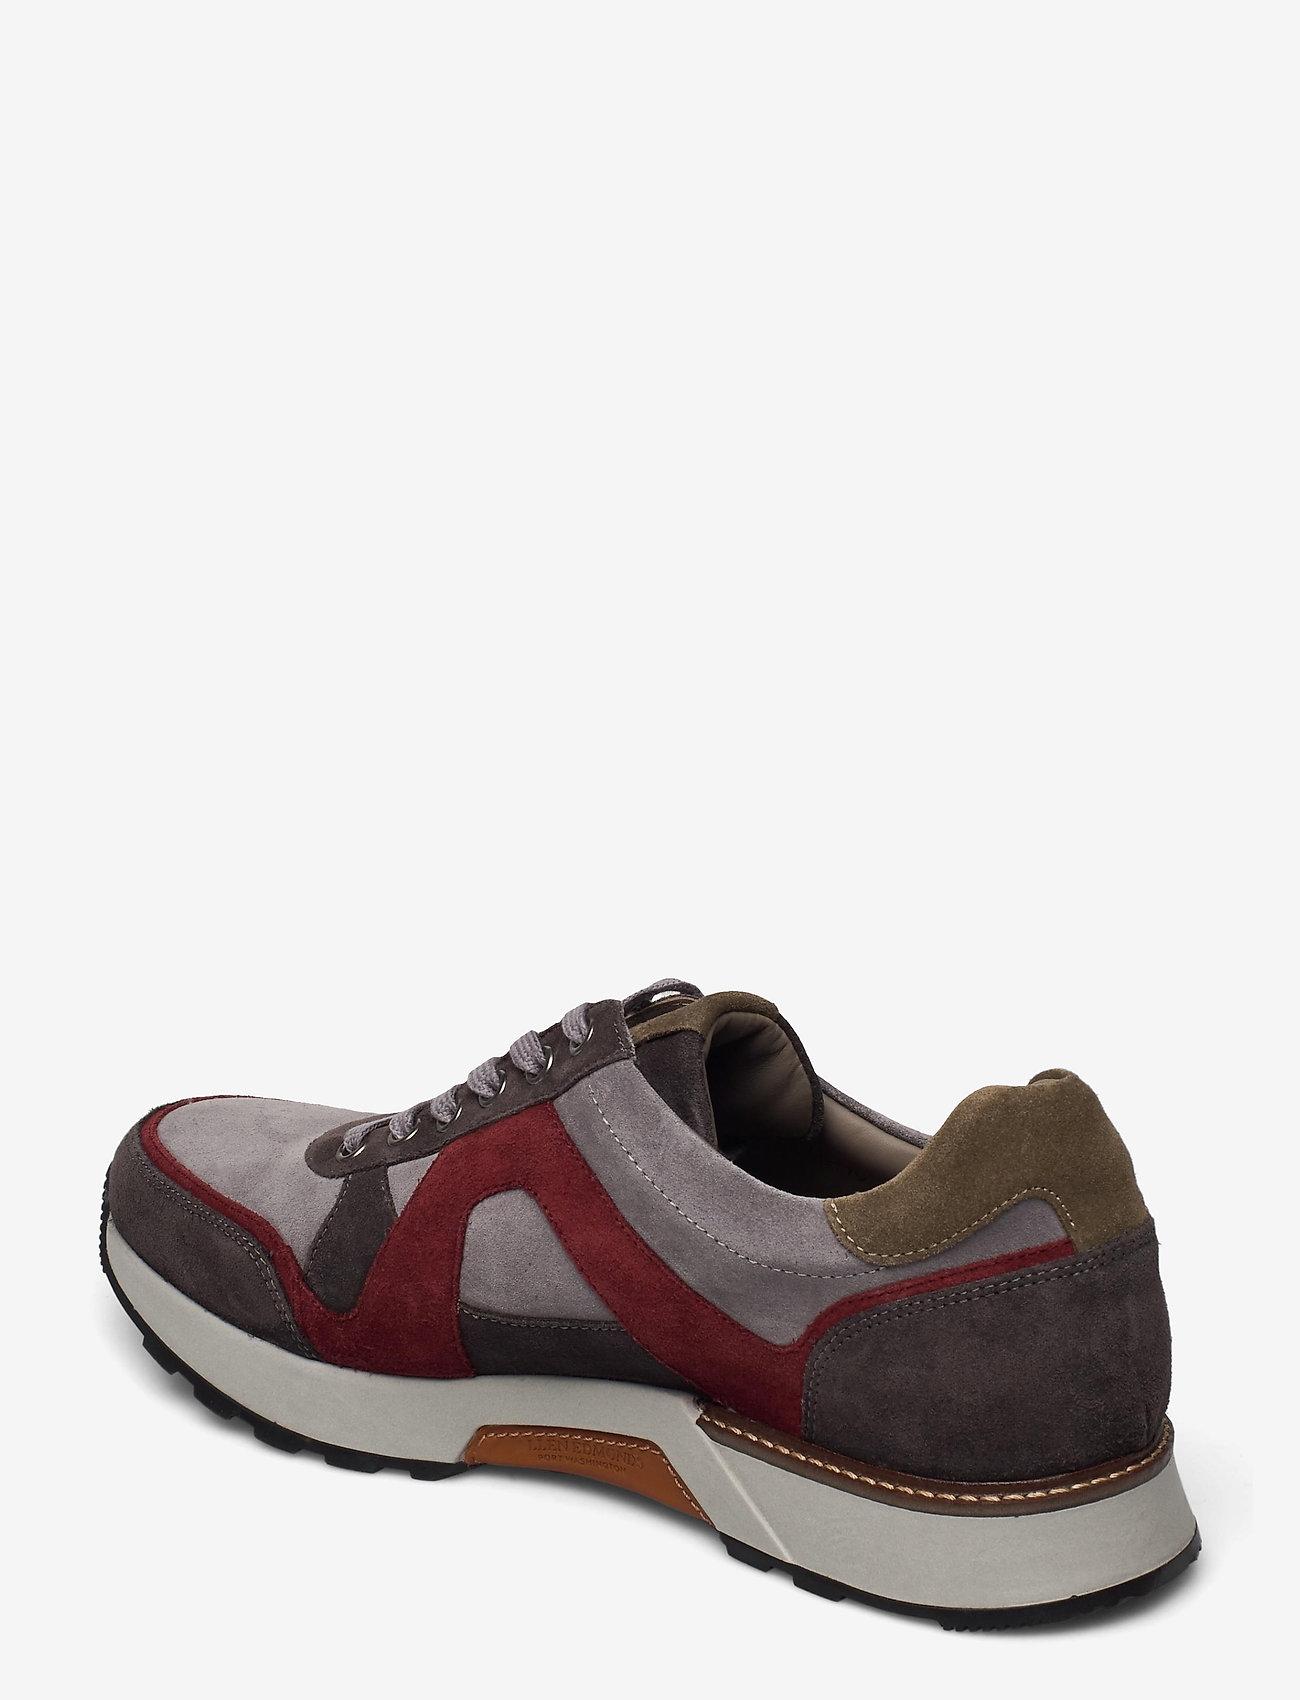 Allen Edmonds - A-Trainer - låga sneakers - grey/burgundy - 2